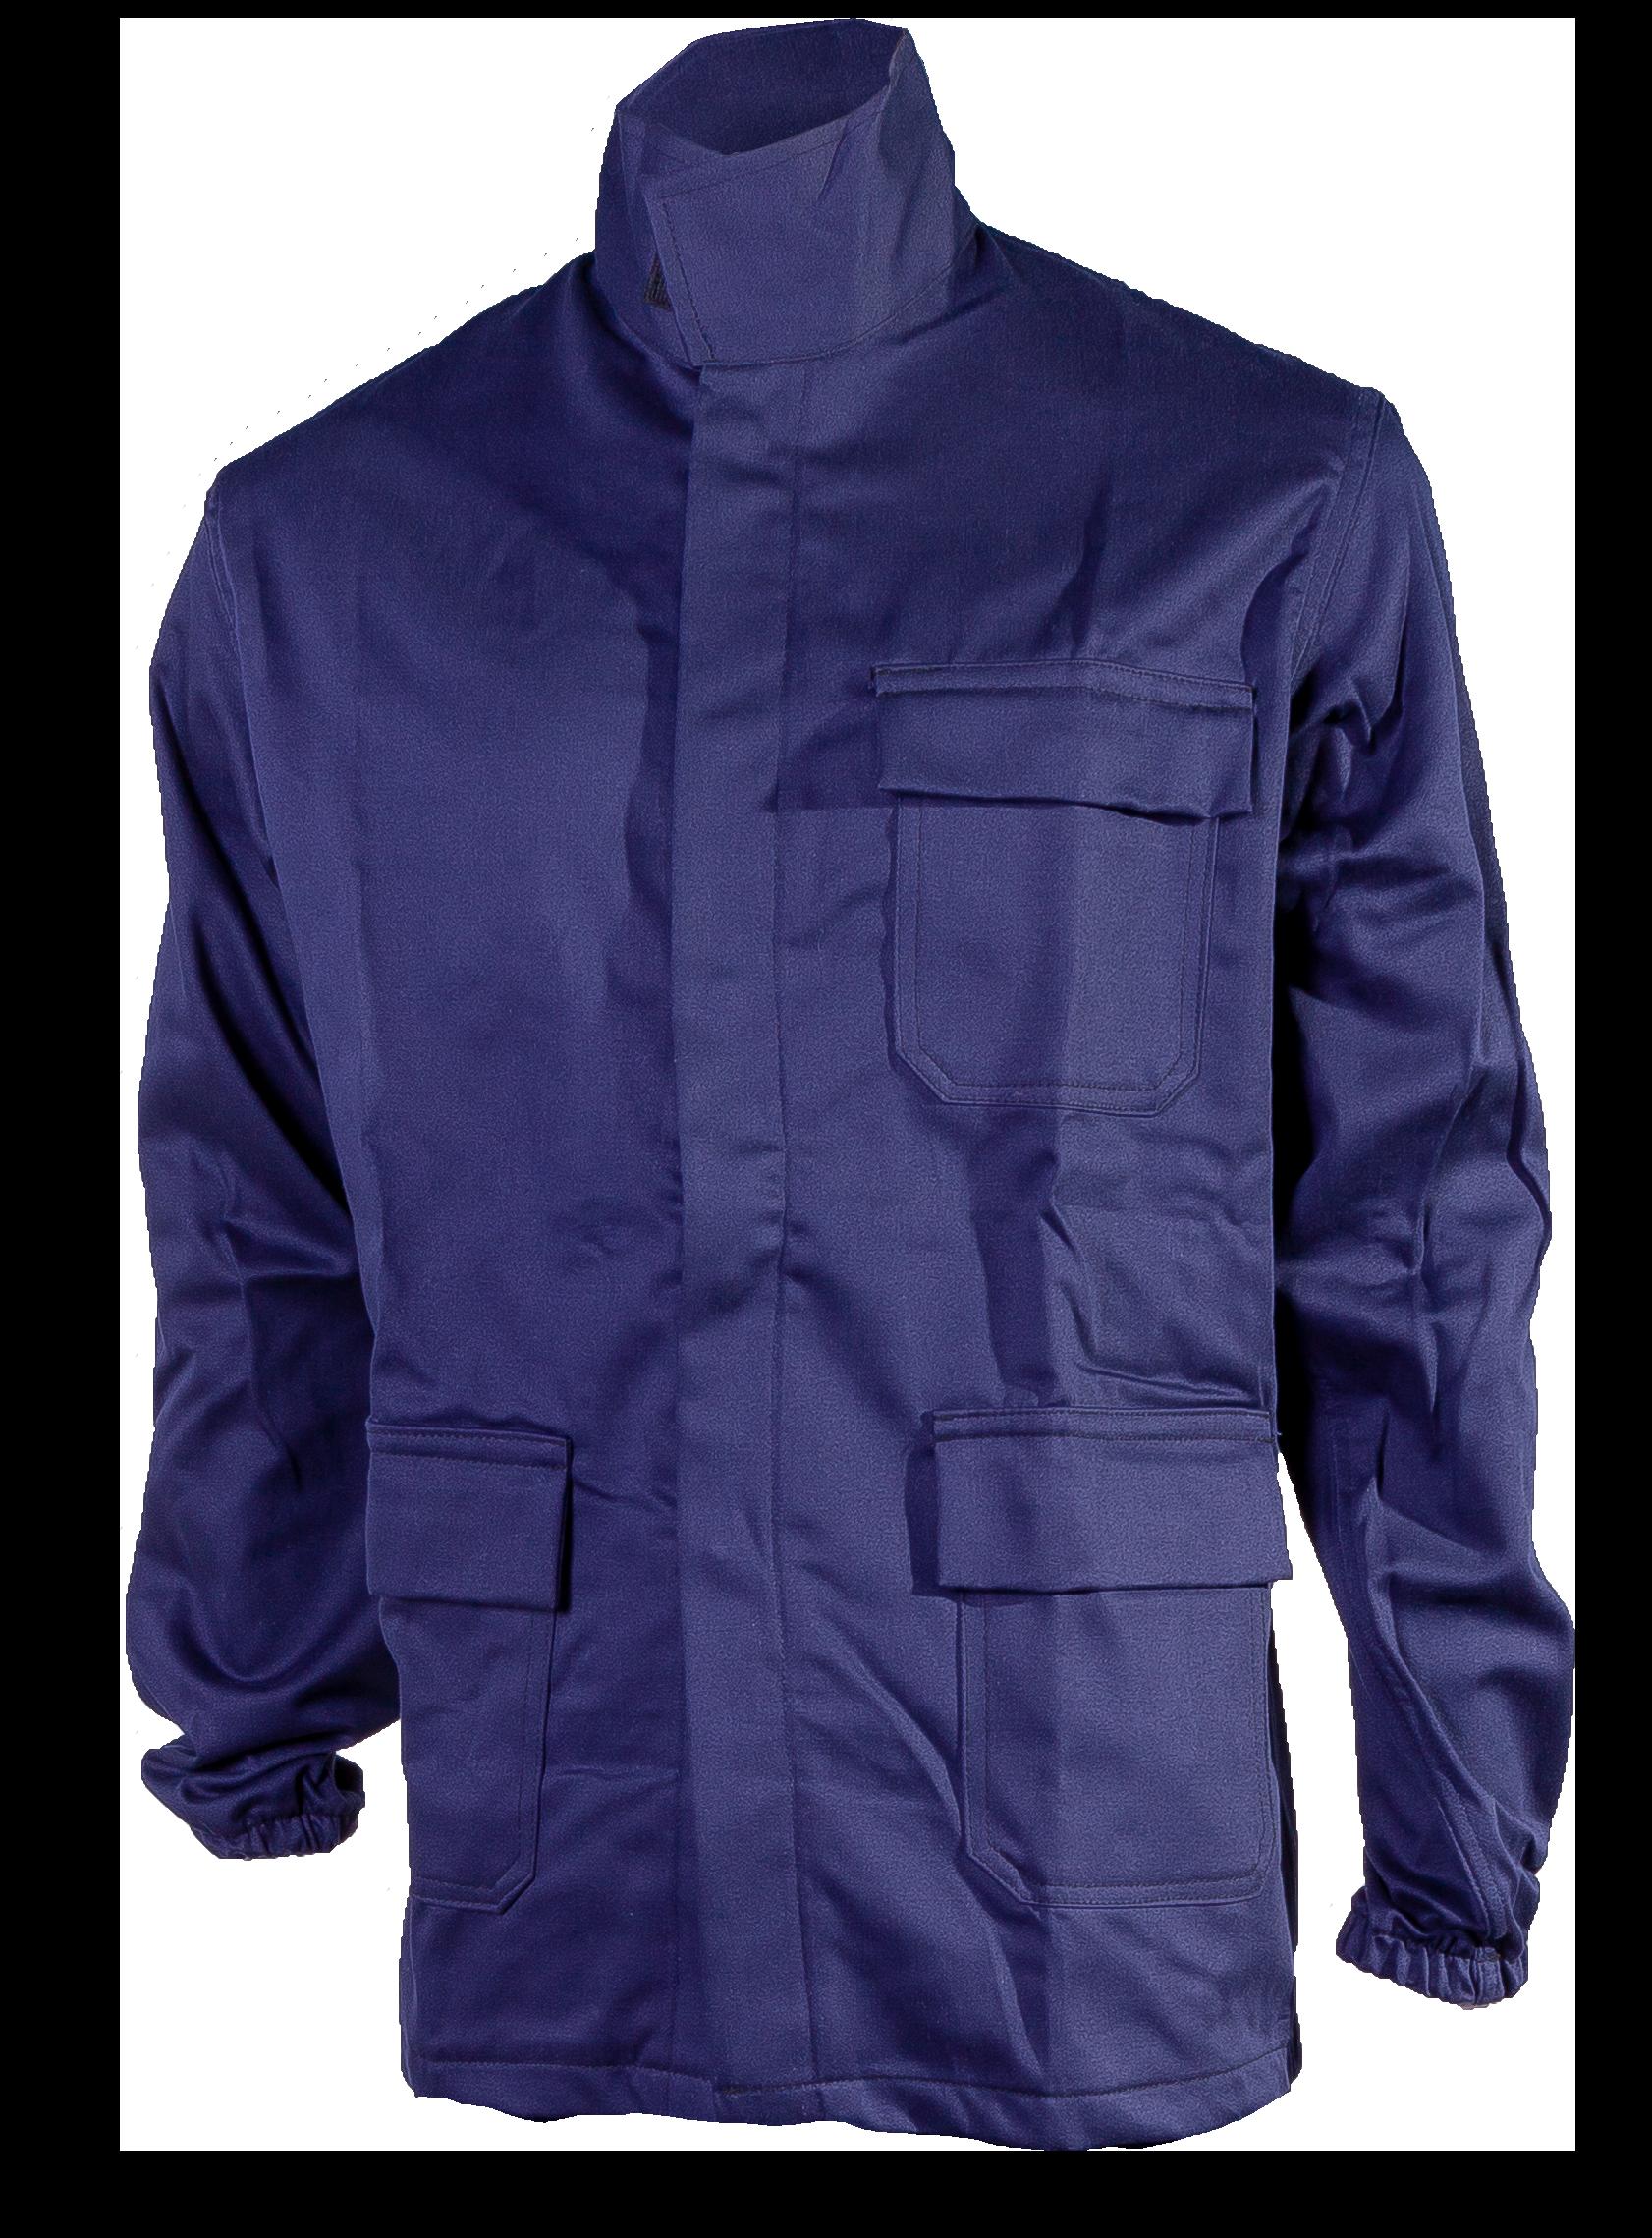 Probes - FR Cotton Jacket Image